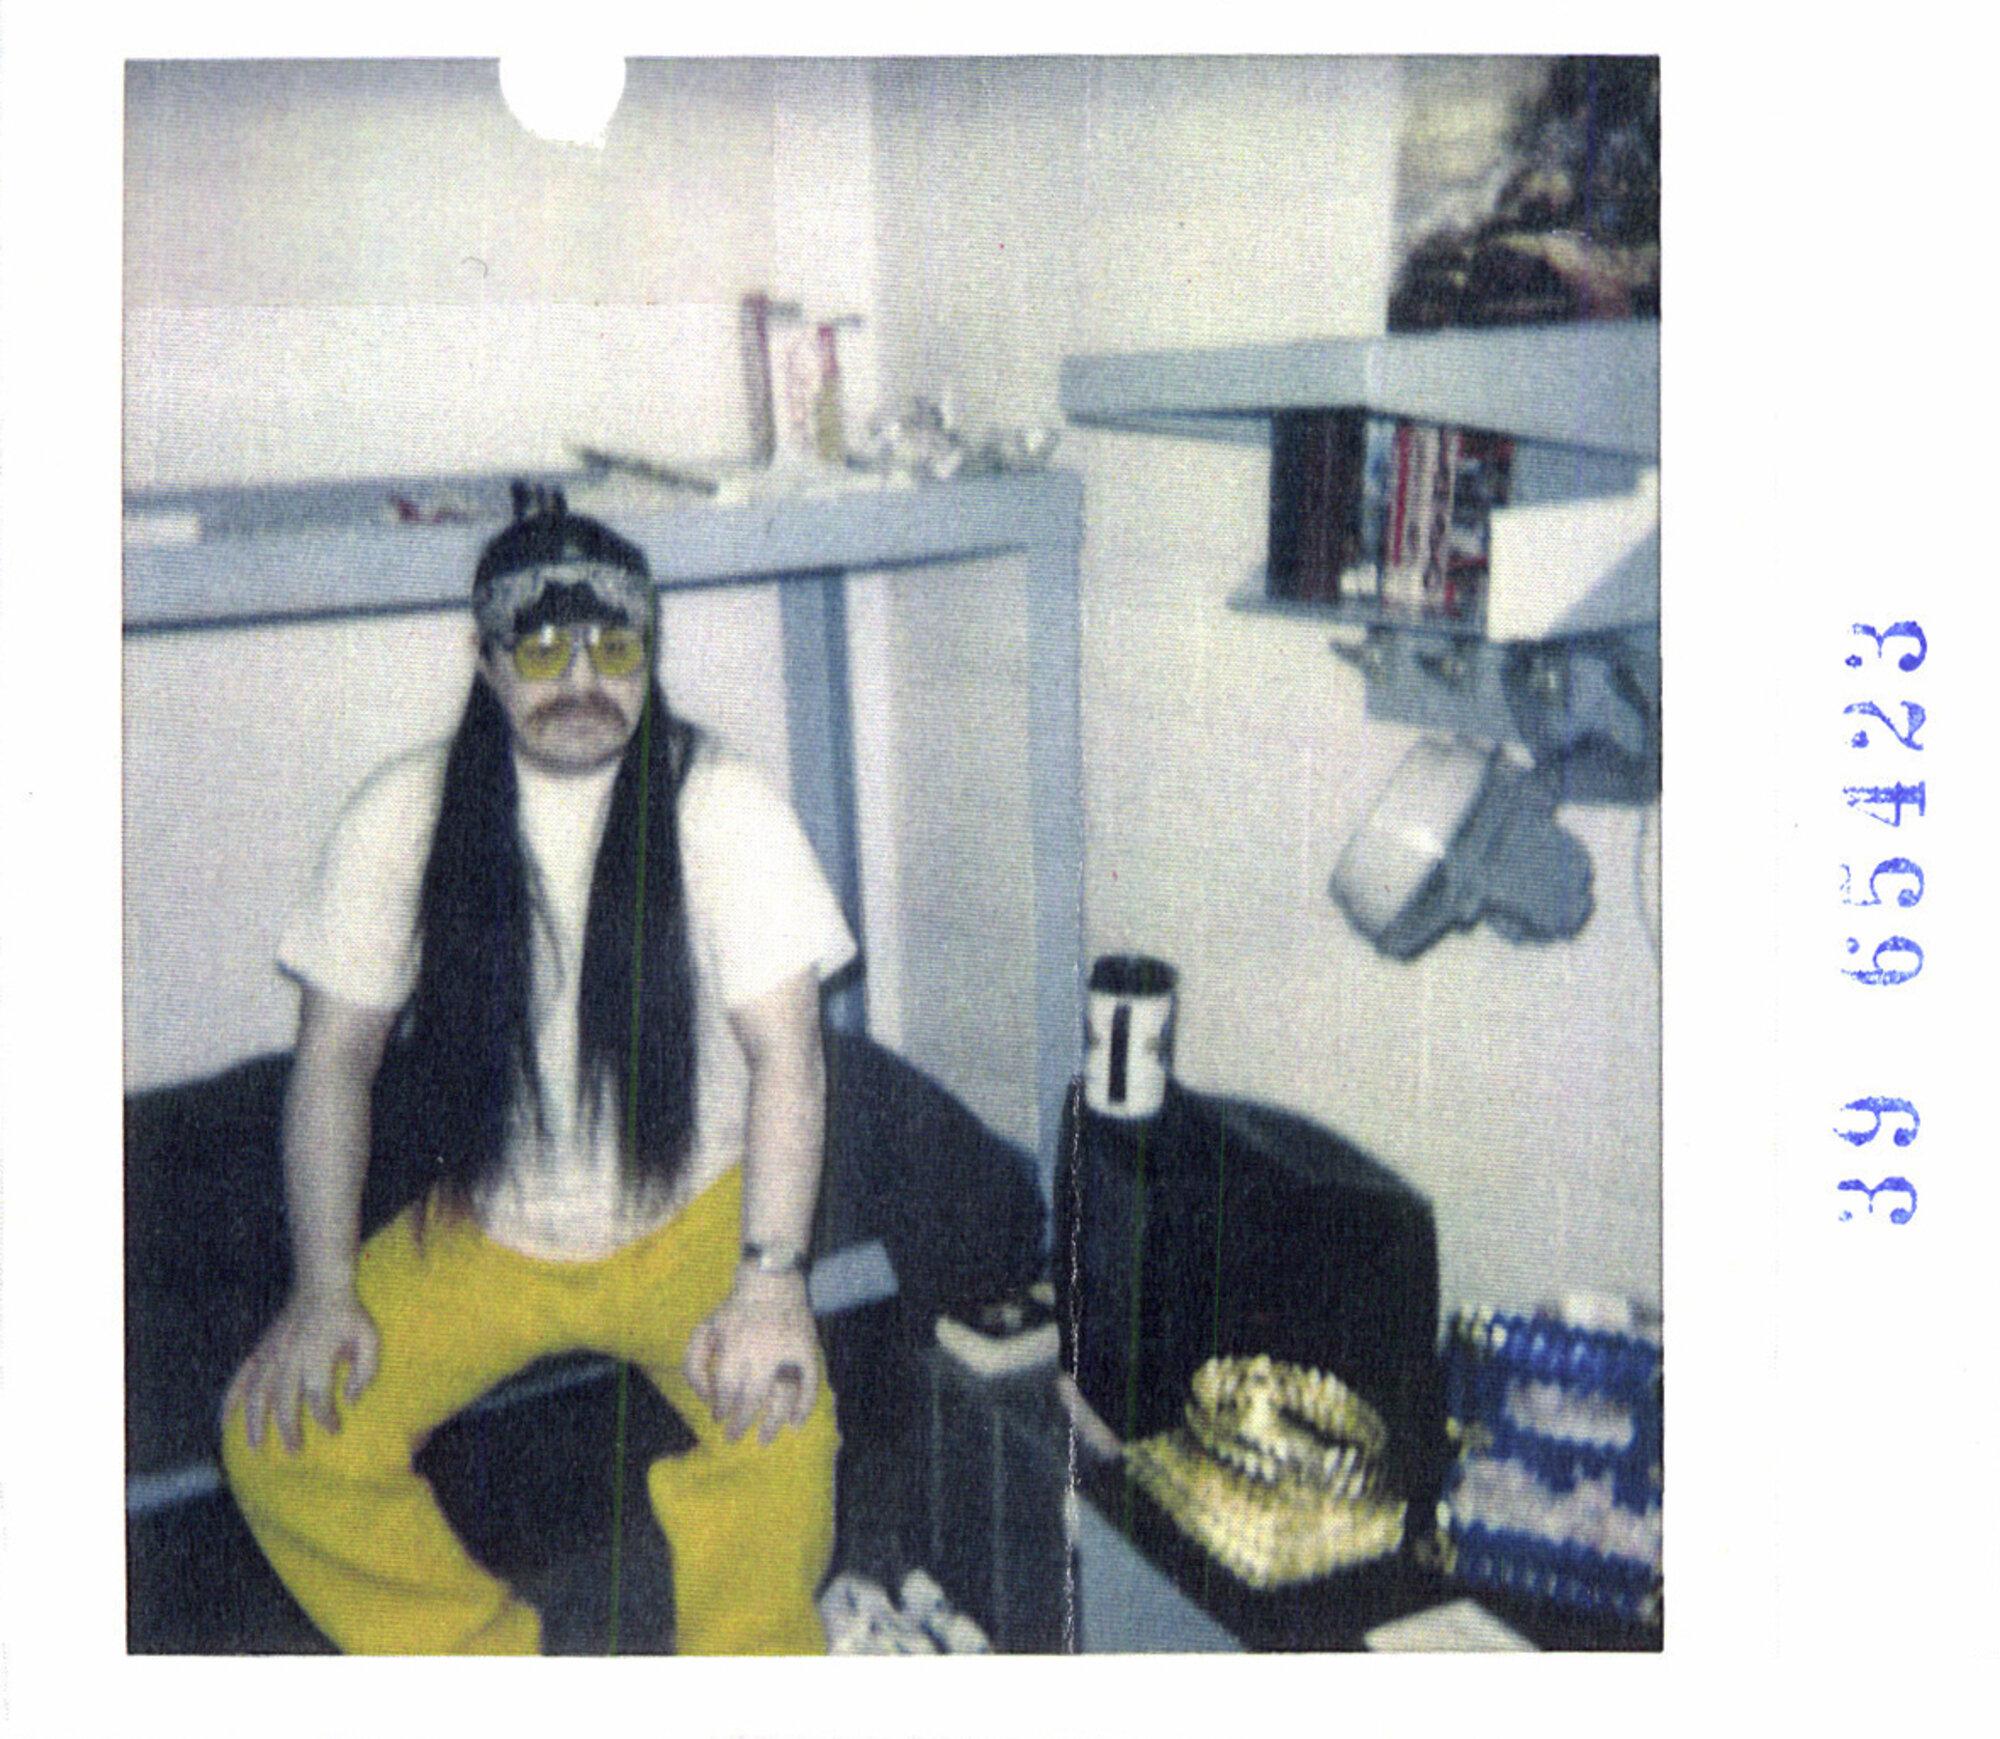 Gerald Pizzuto Jr., circa 2000.